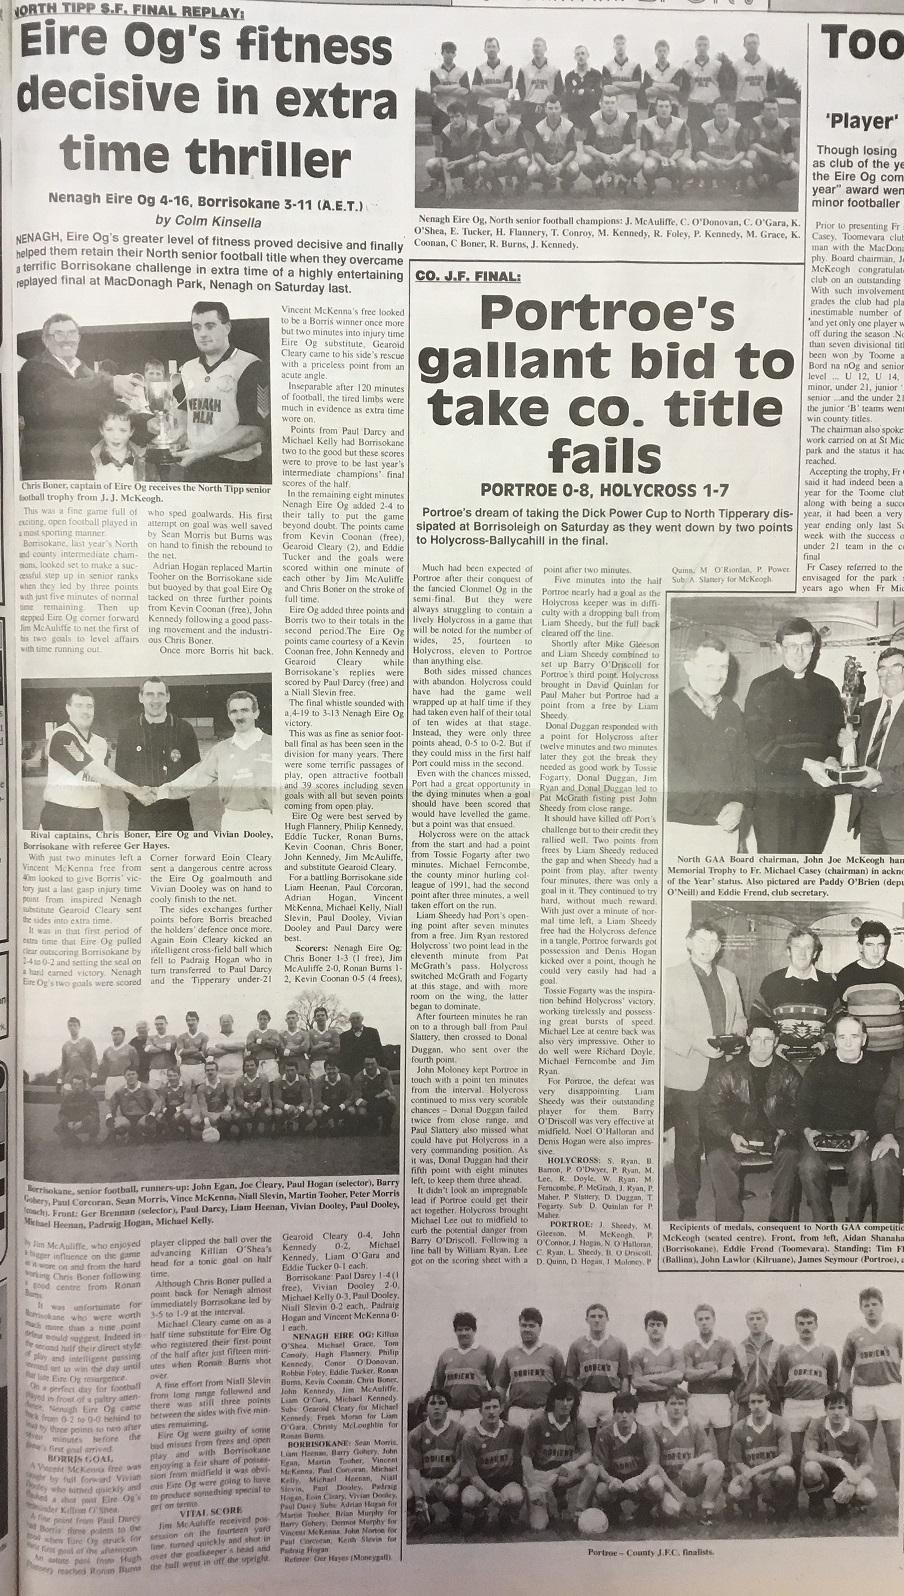 1995 North football final replay